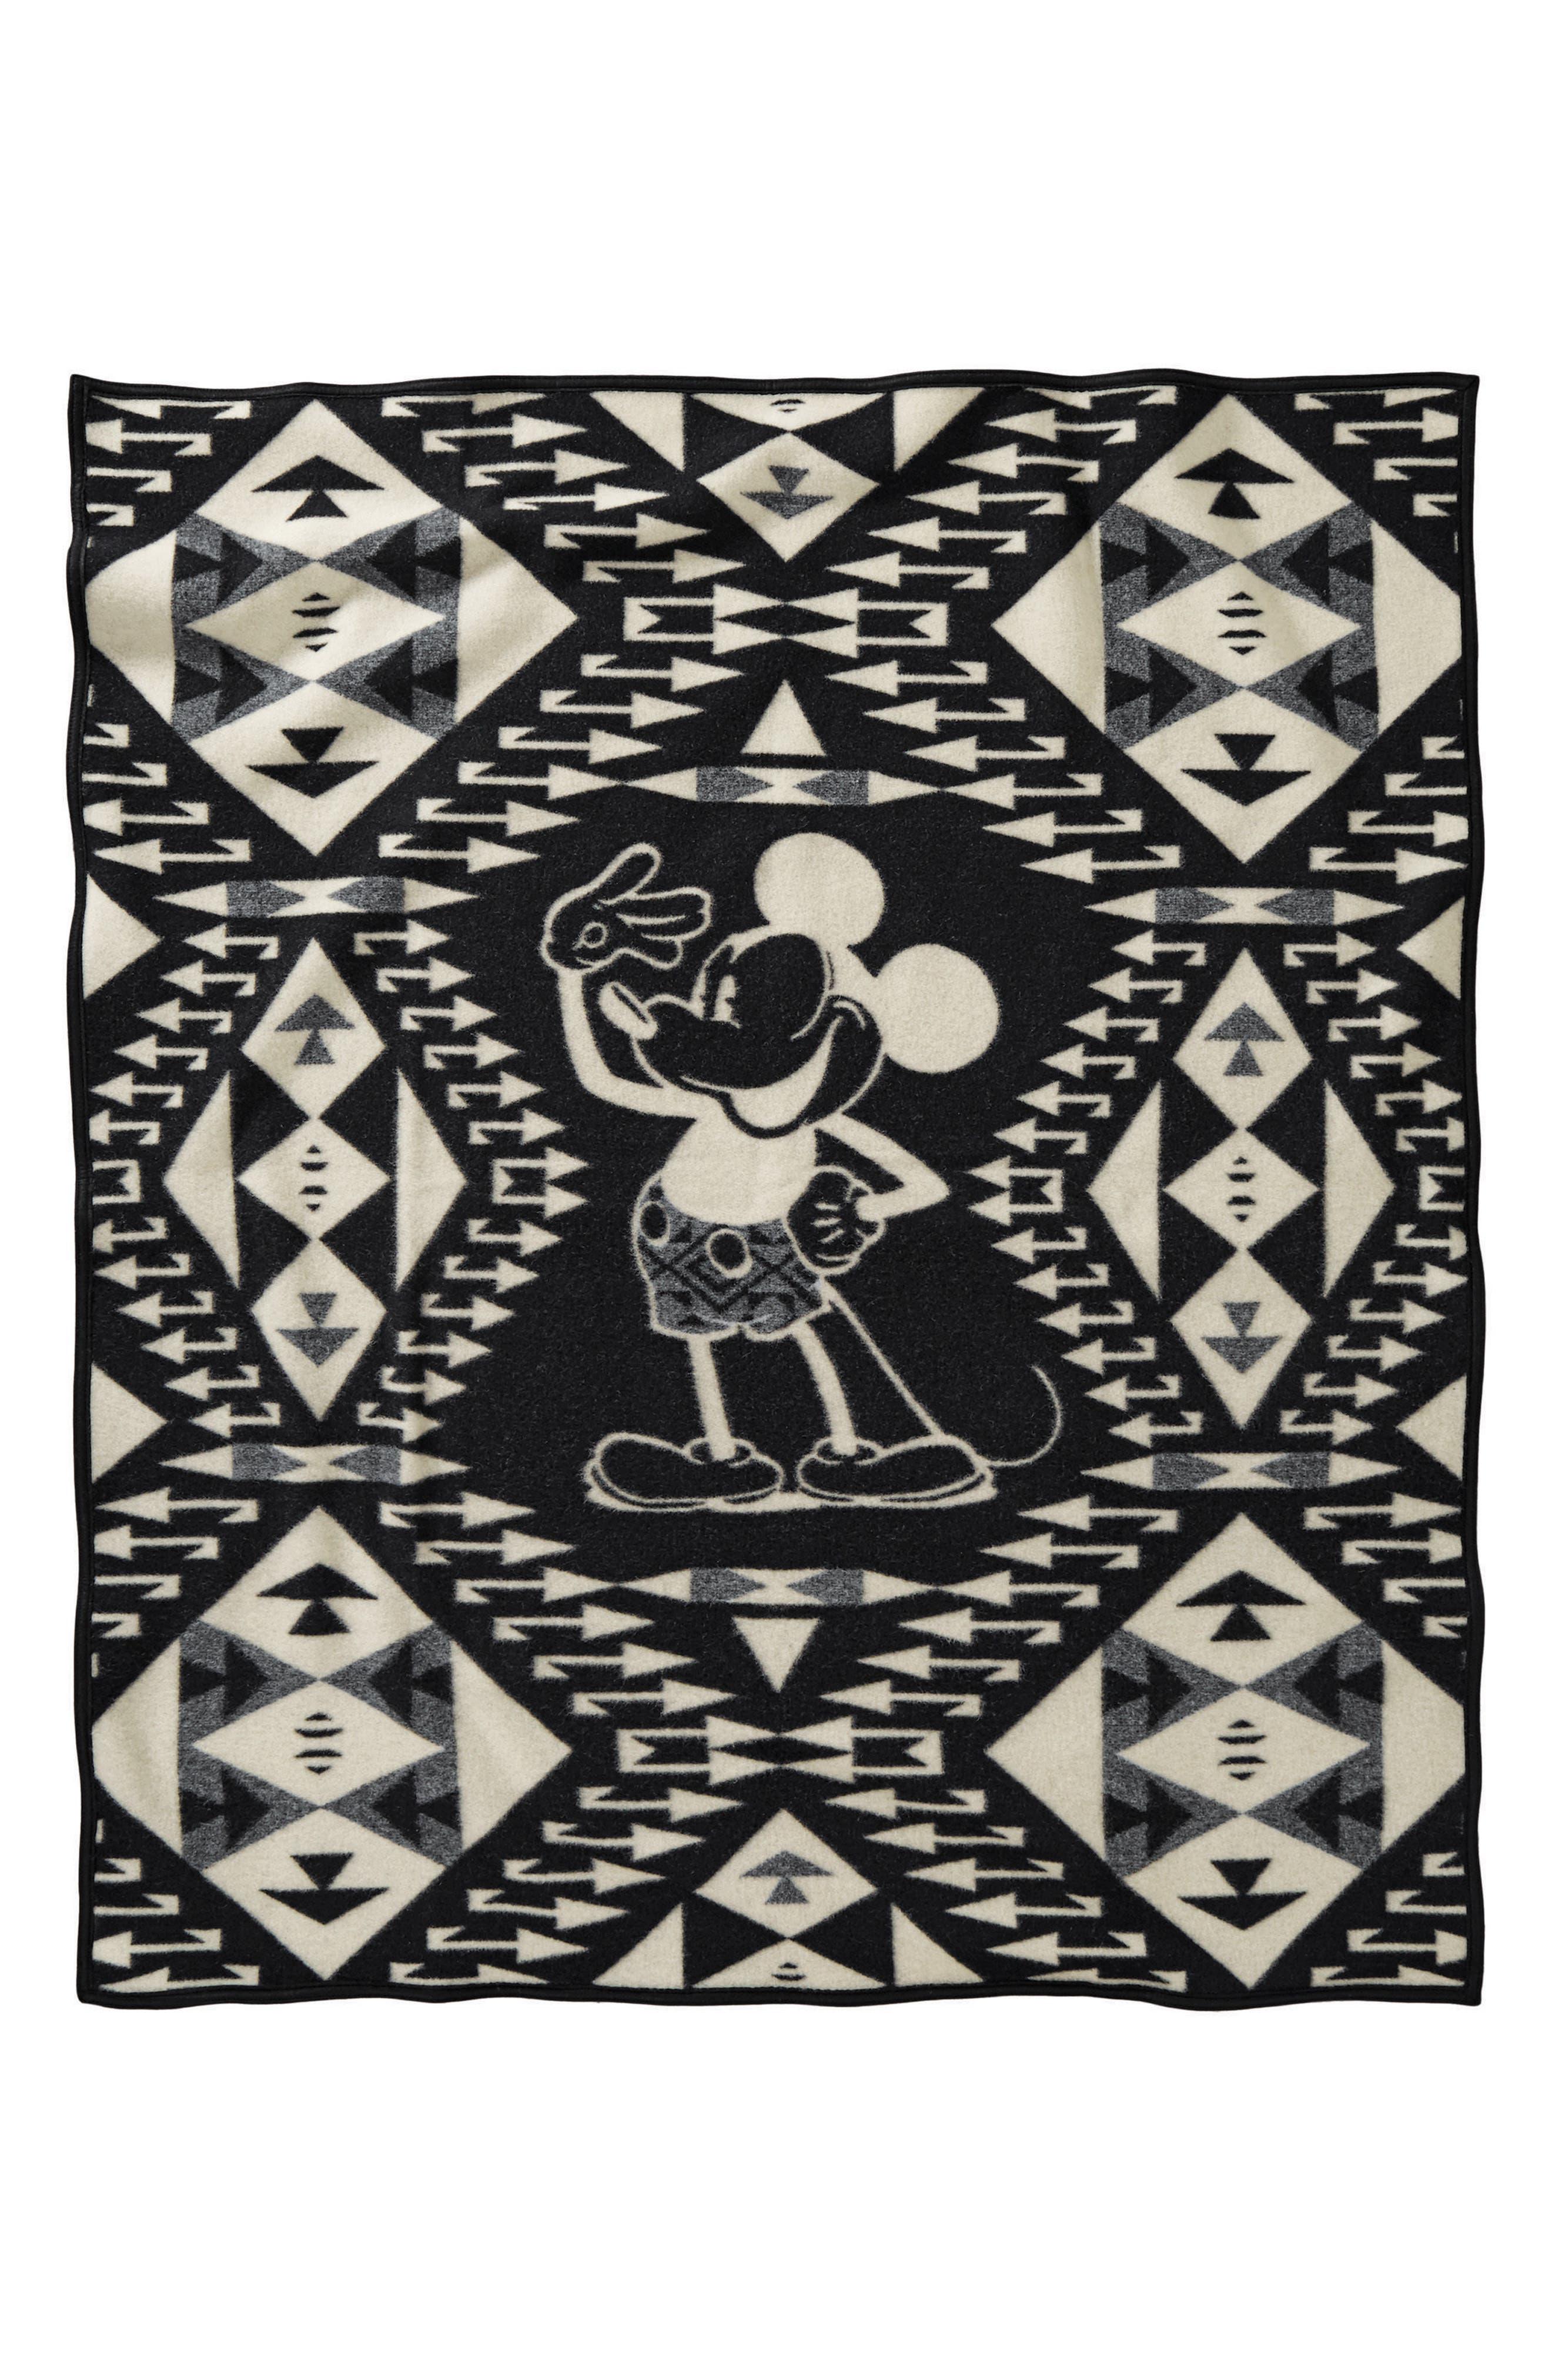 Mickey's Salute Blanket Throw,                             Alternate thumbnail 2, color,                             Black/ White